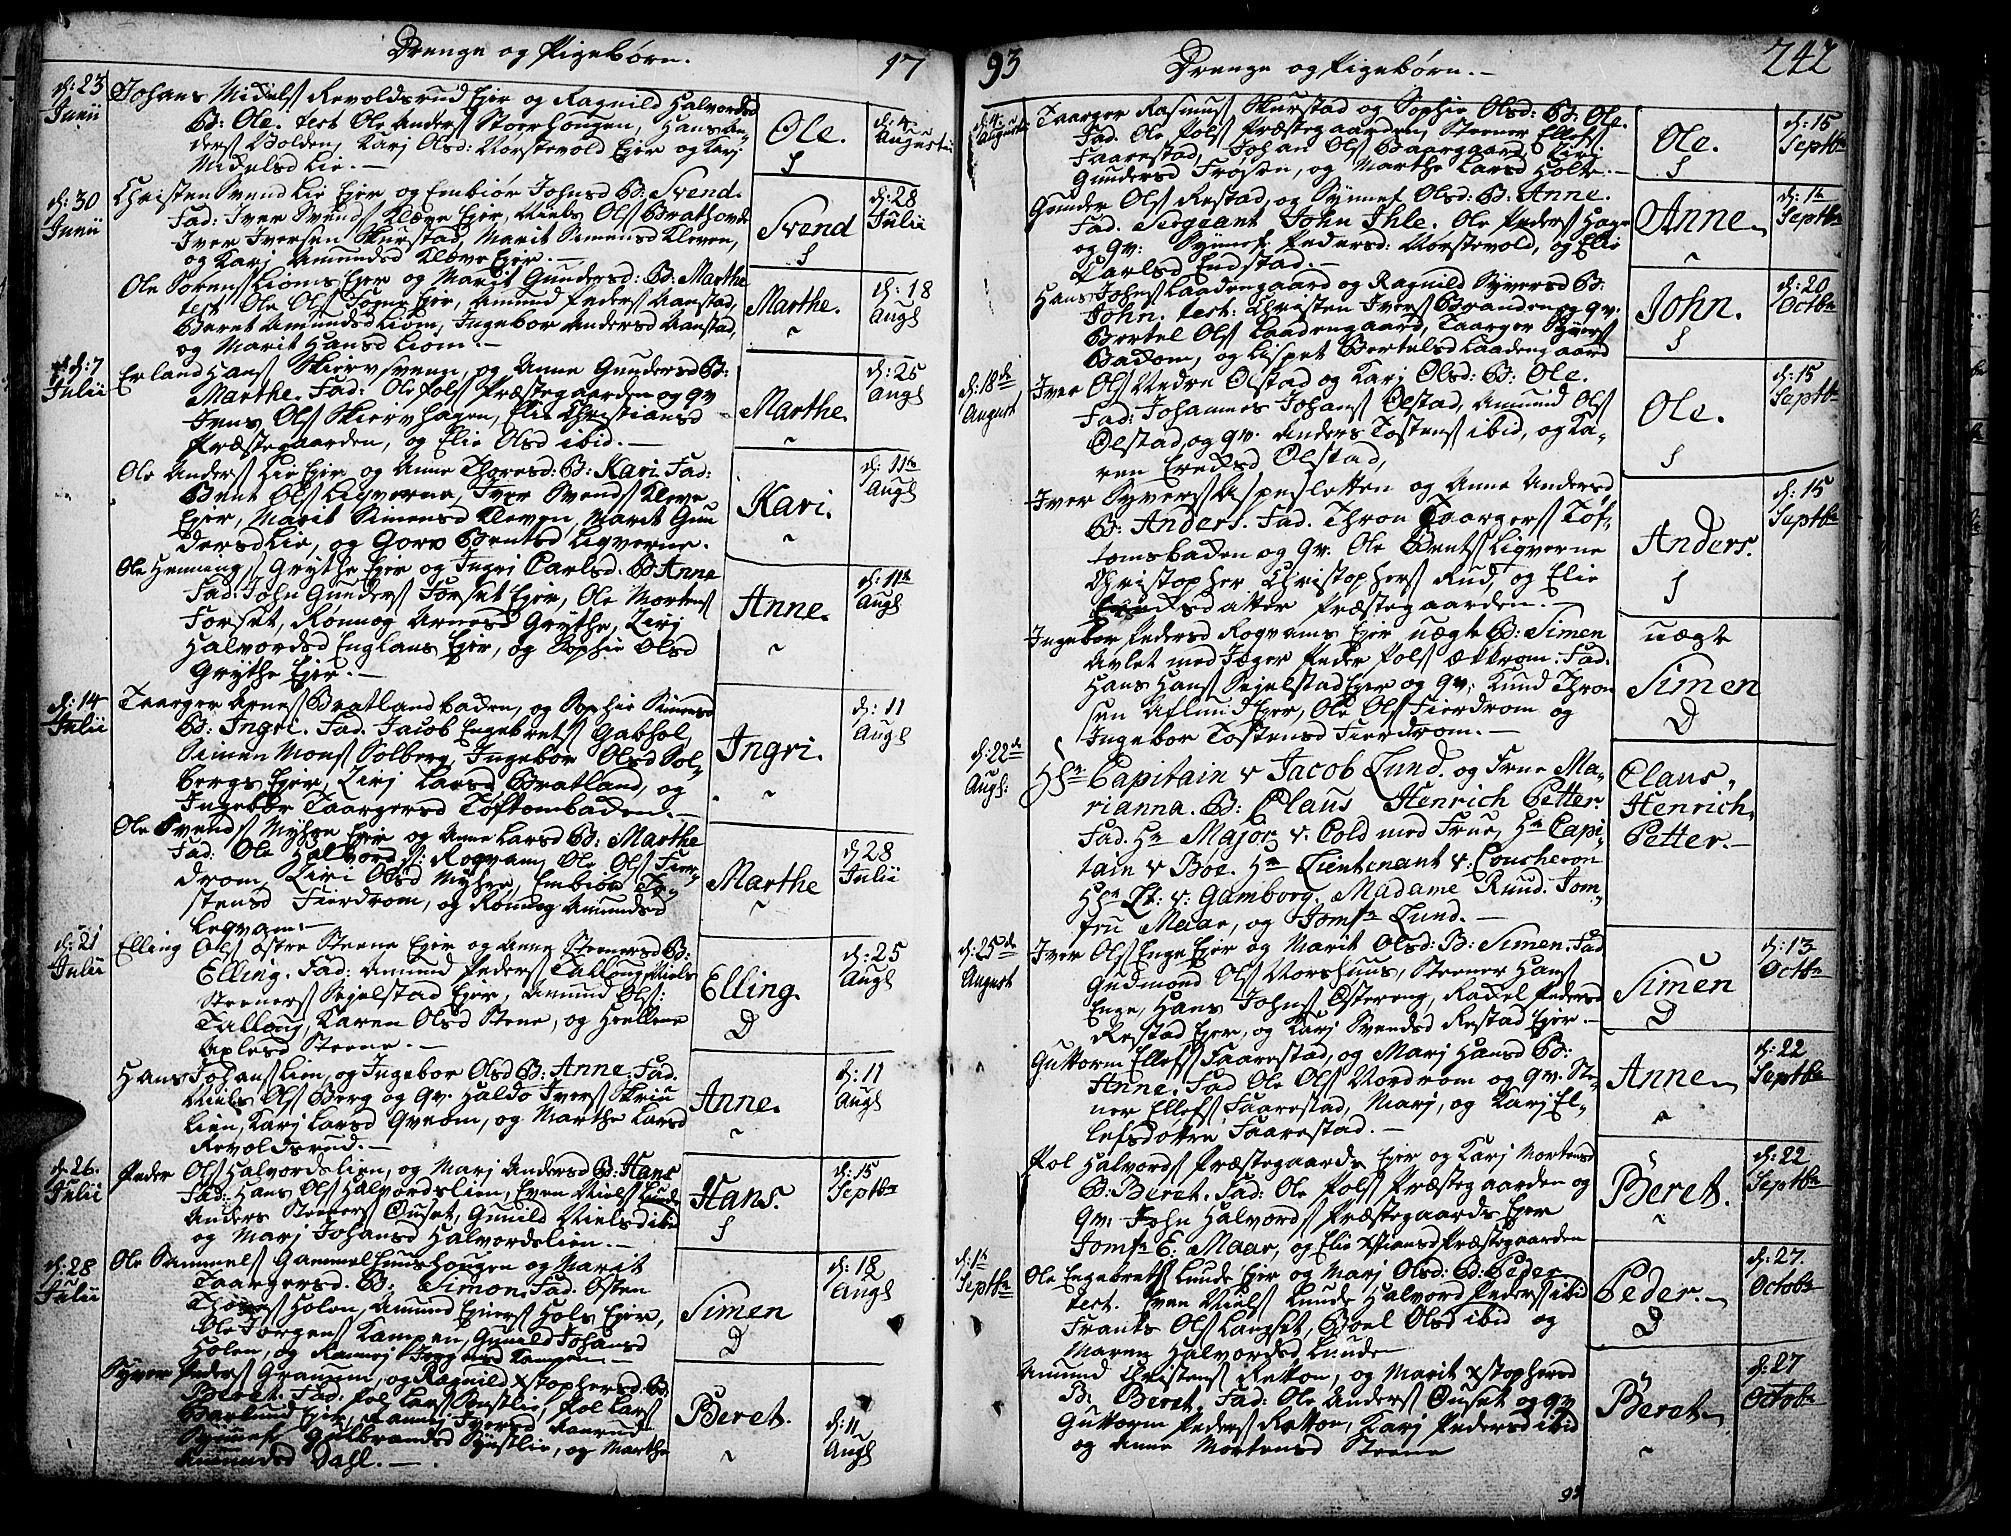 SAH, Gausdal prestekontor, Ministerialbok nr. 3, 1758-1809, s. 242